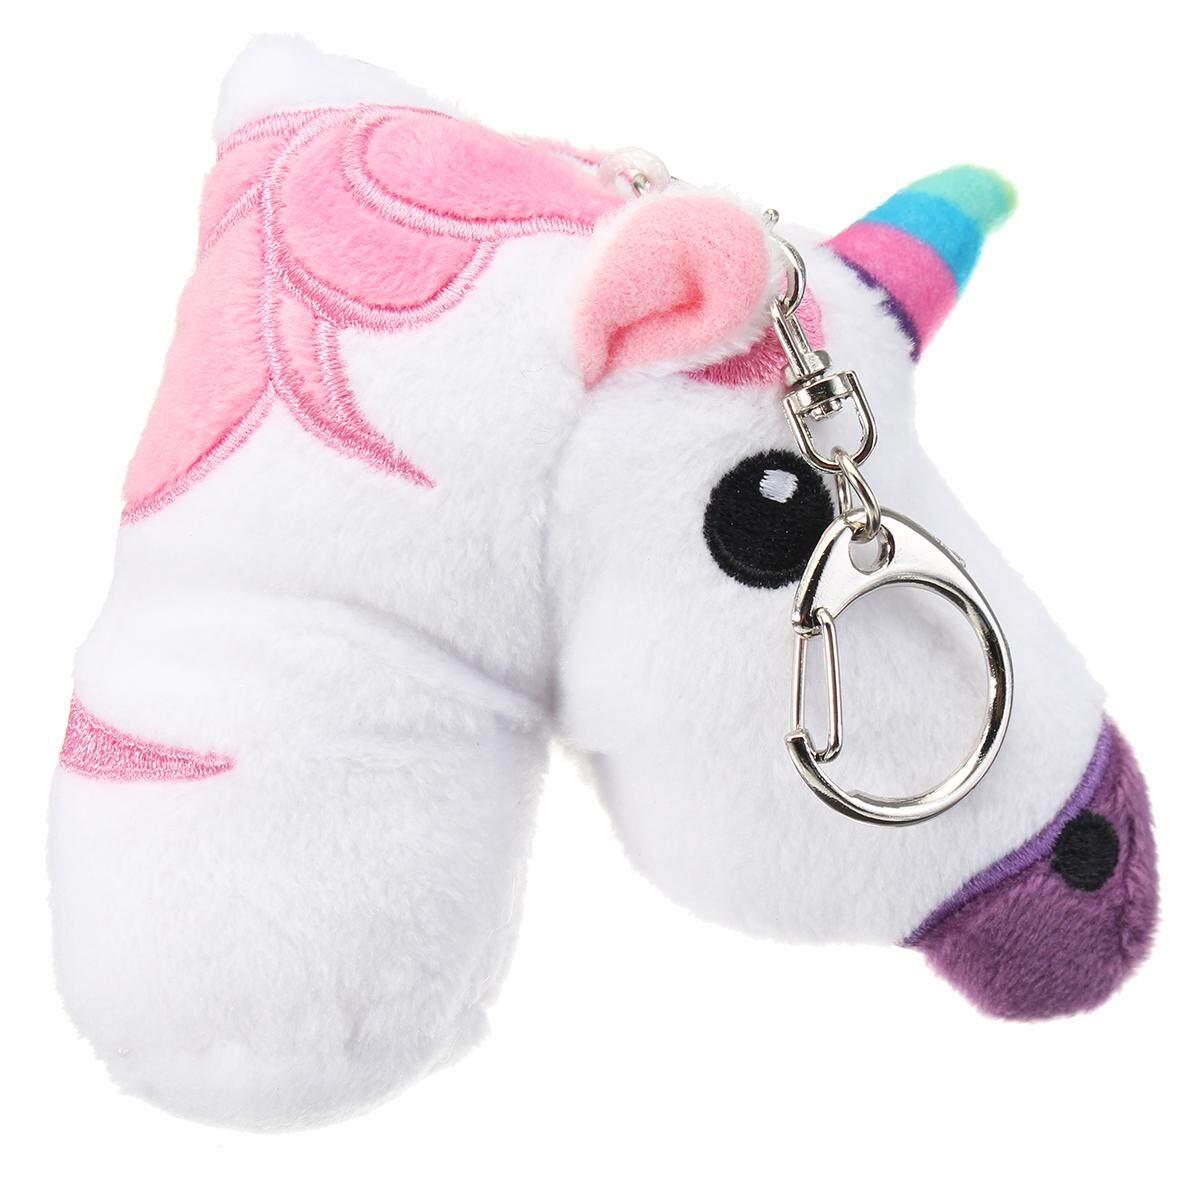 Rainbow Unicorn Horse Plush Toy Key Ring Key Chain Buckle Bag Pendant Ornaments